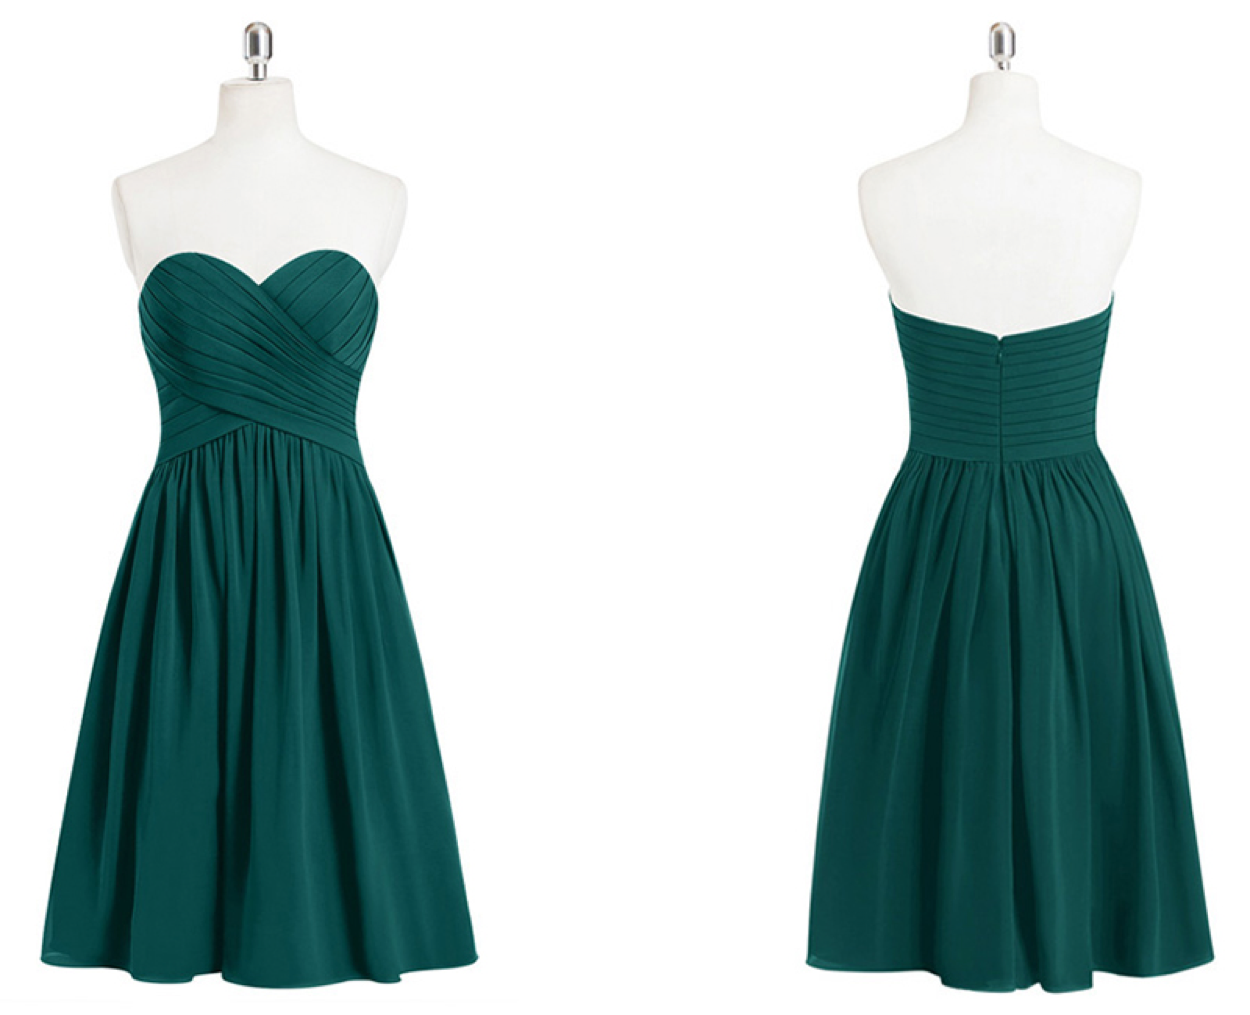 New Azazie Styles: 15 New Bridesmaid Dresses | Azazie | Blog - photo #37